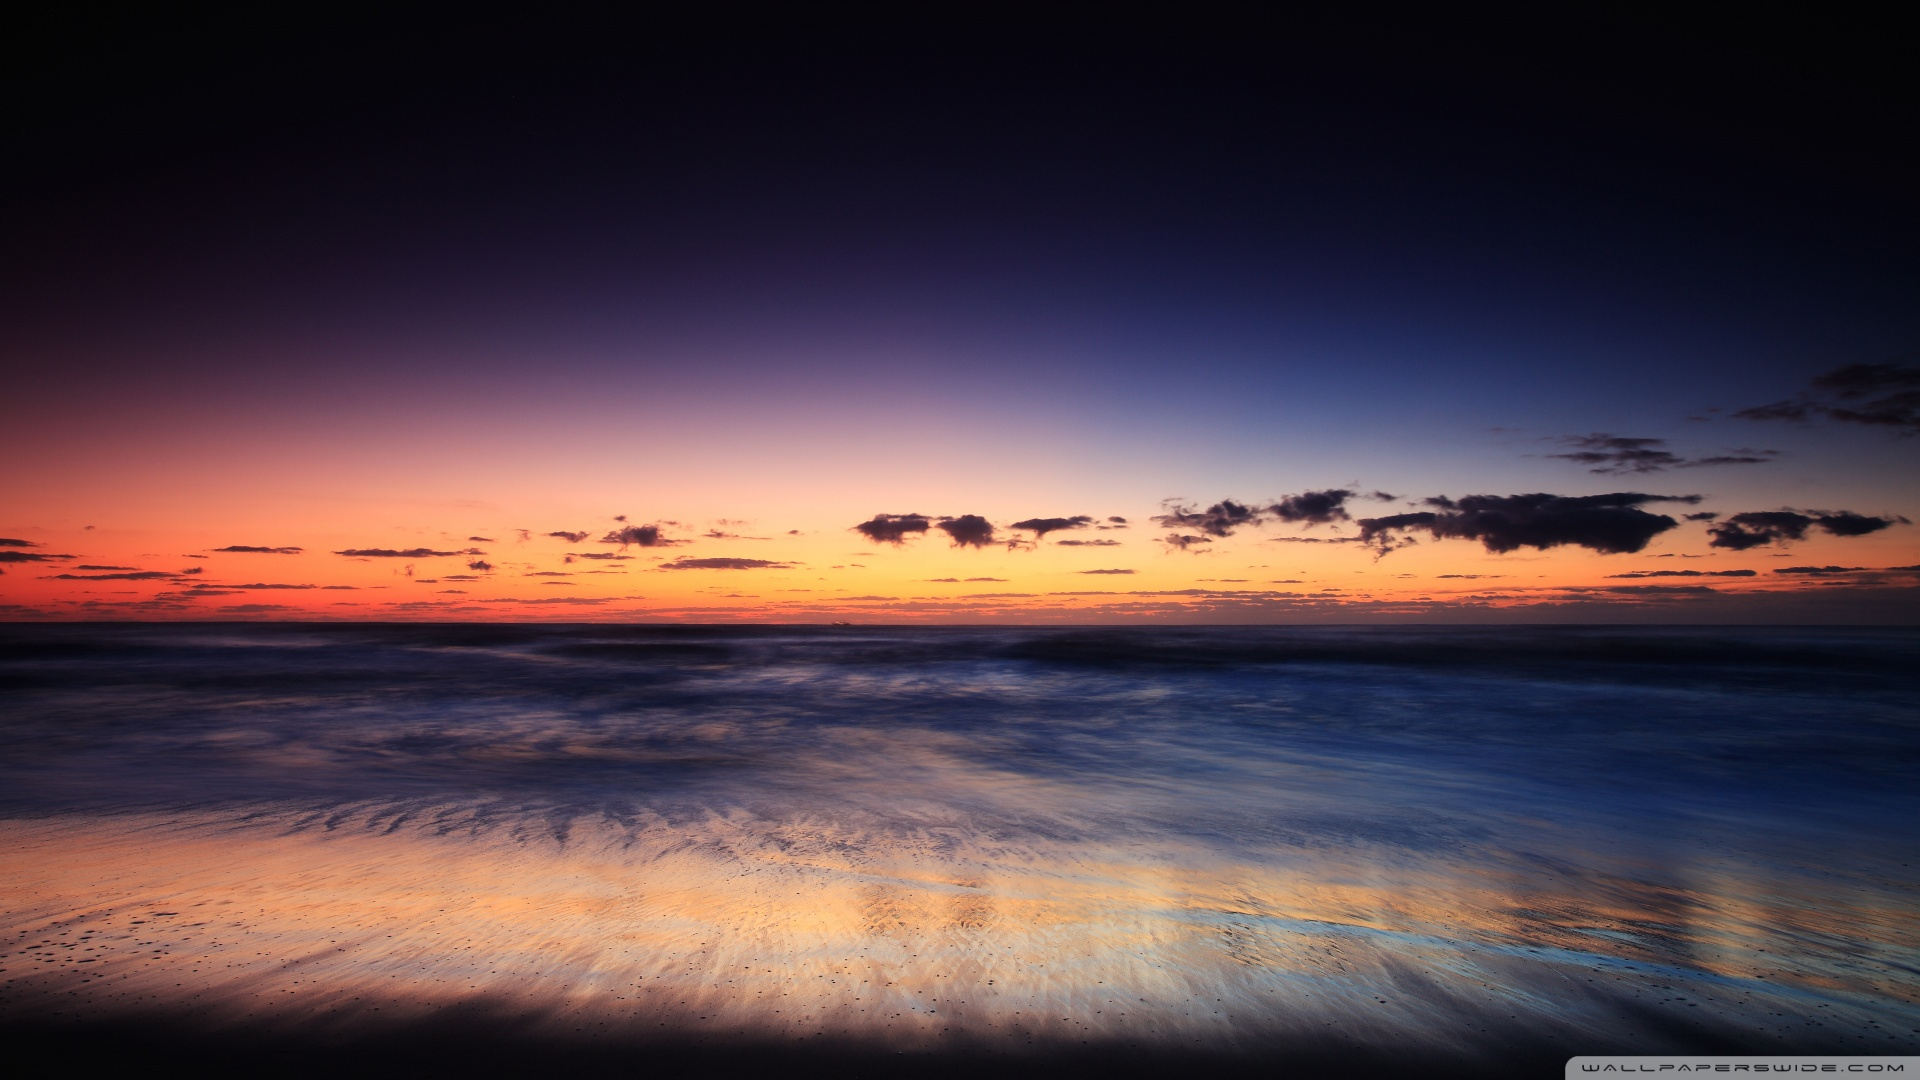 Download Ocean Beach Wallpaper 1920x1080 Wallpoper 450778 1920x1080